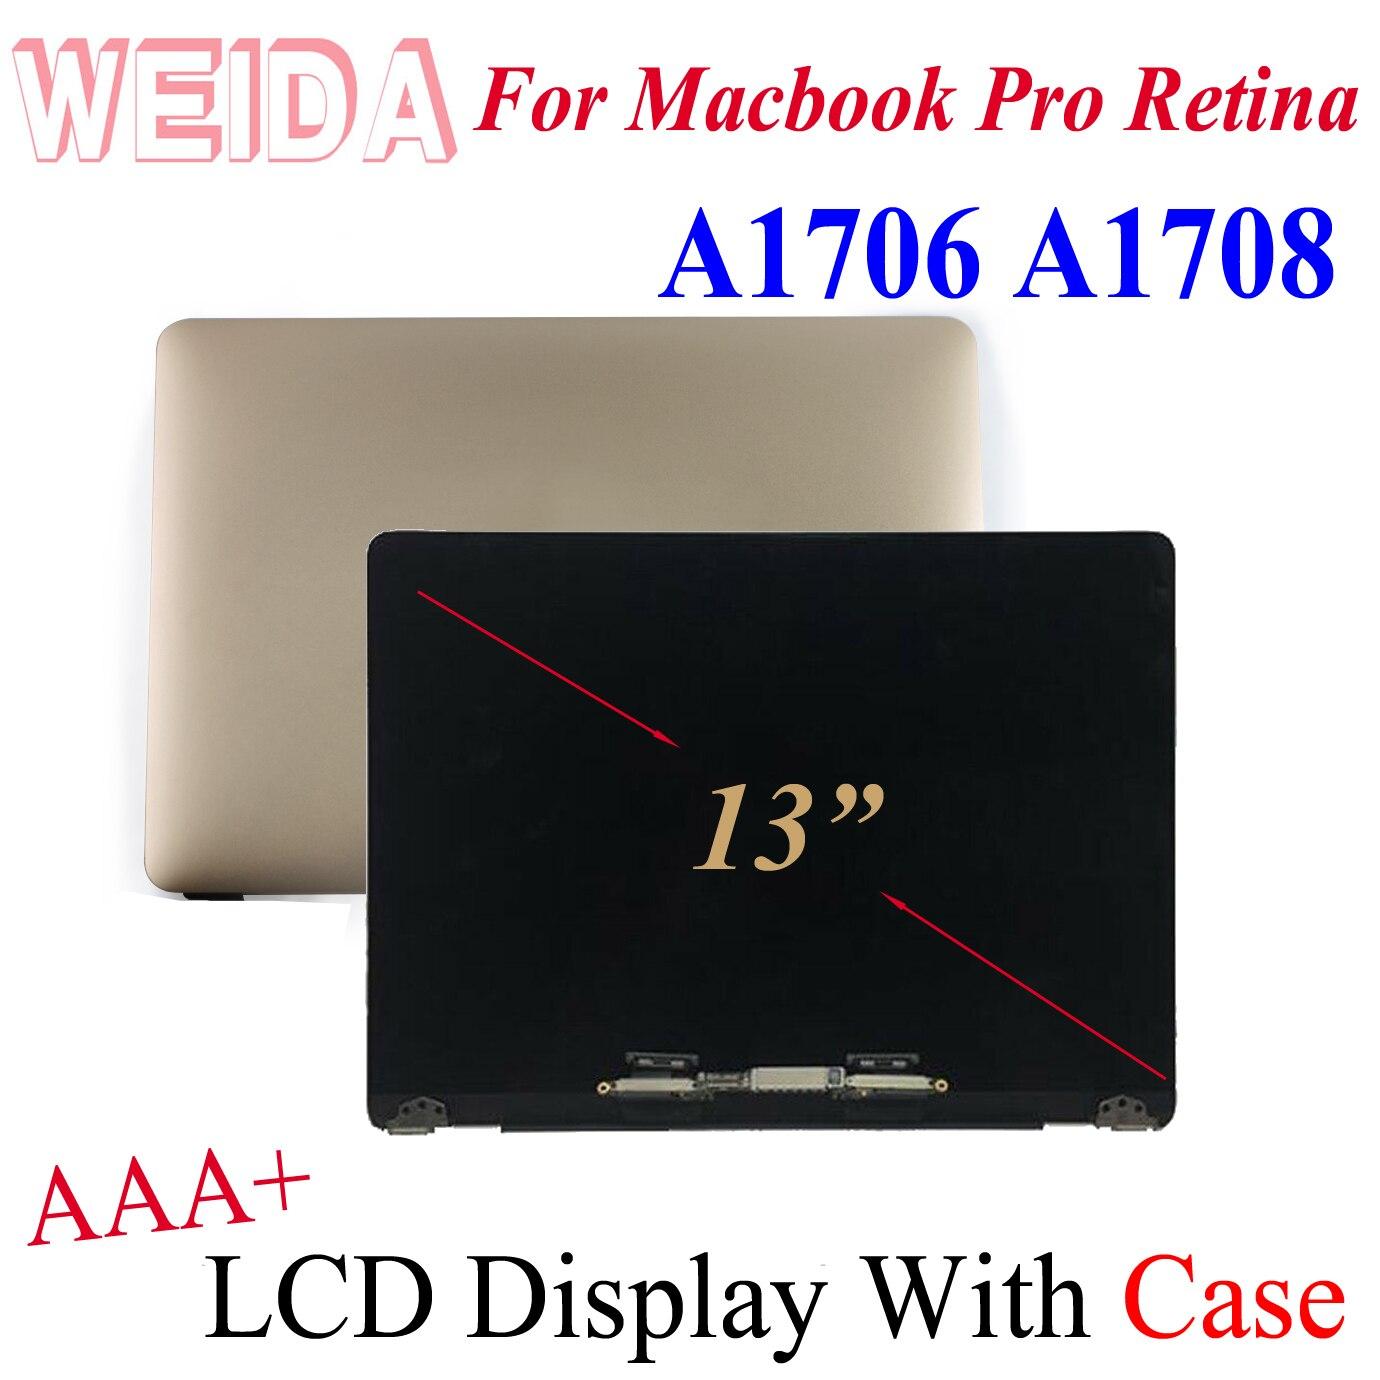 WEIDA 95% New LCD For Macbook Pro Retina 13